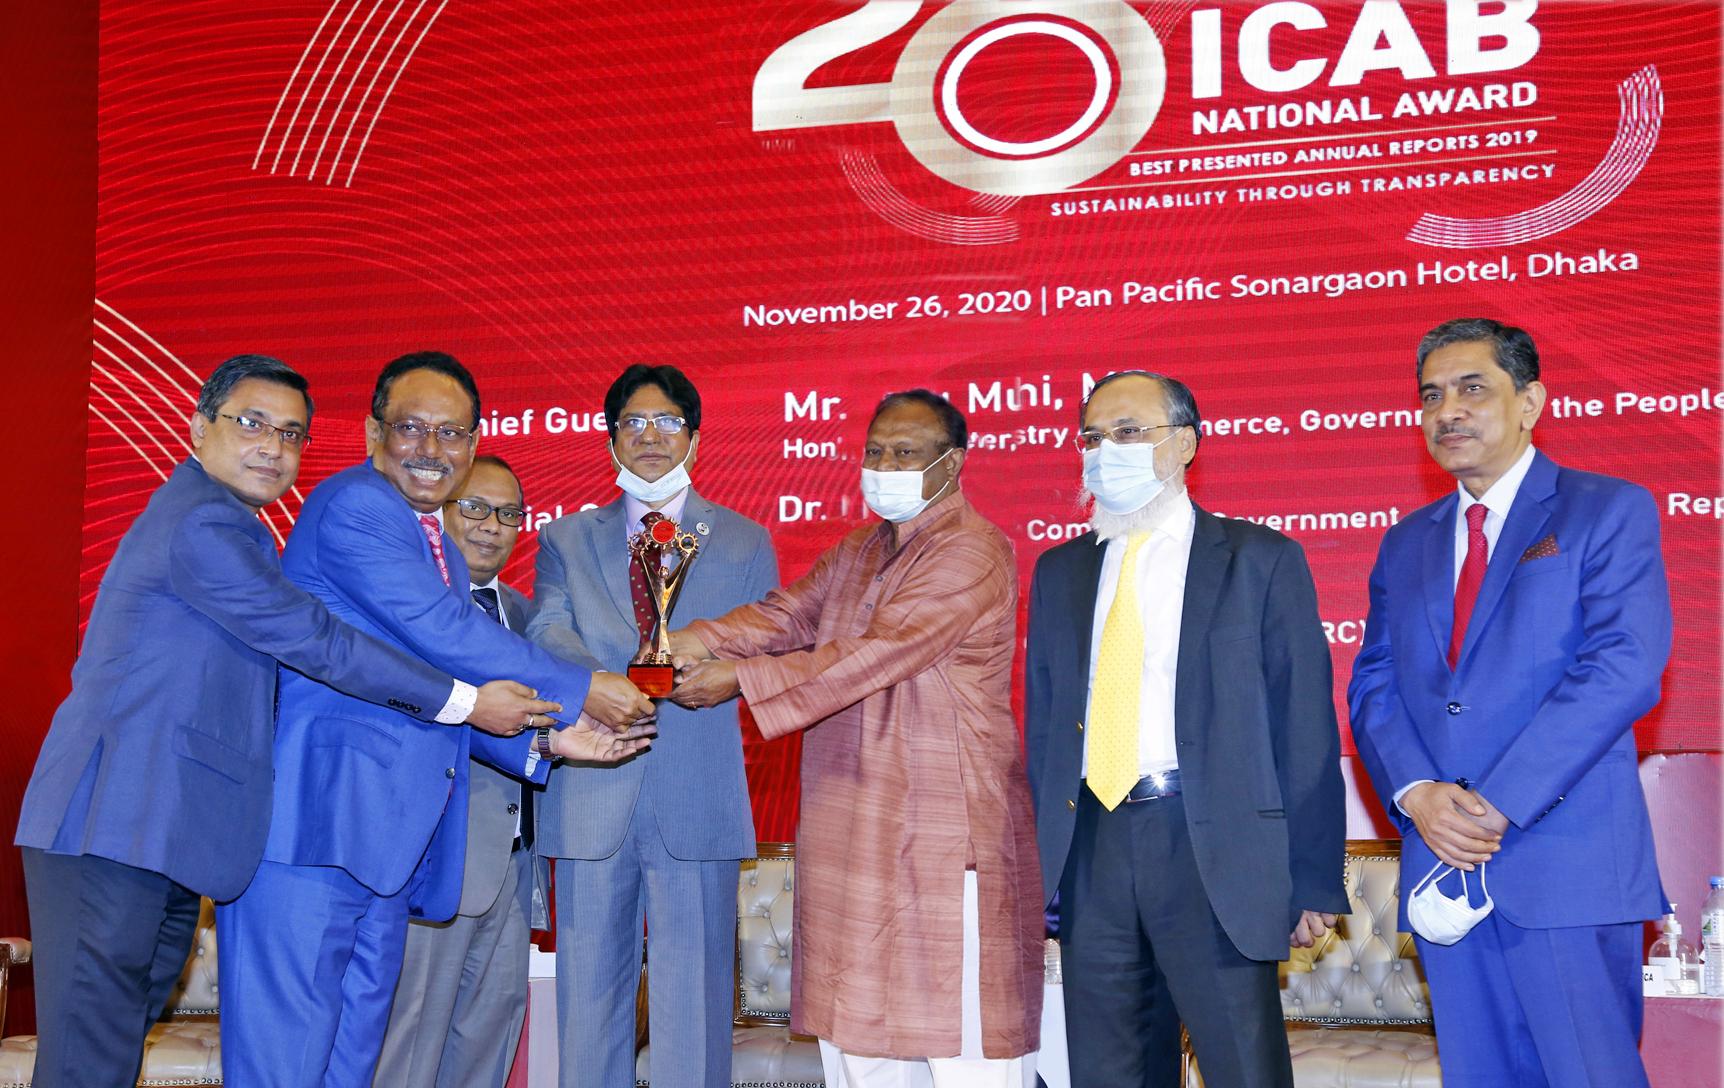 Mercantile Bank awarded '20th ICAB National Award 2019'